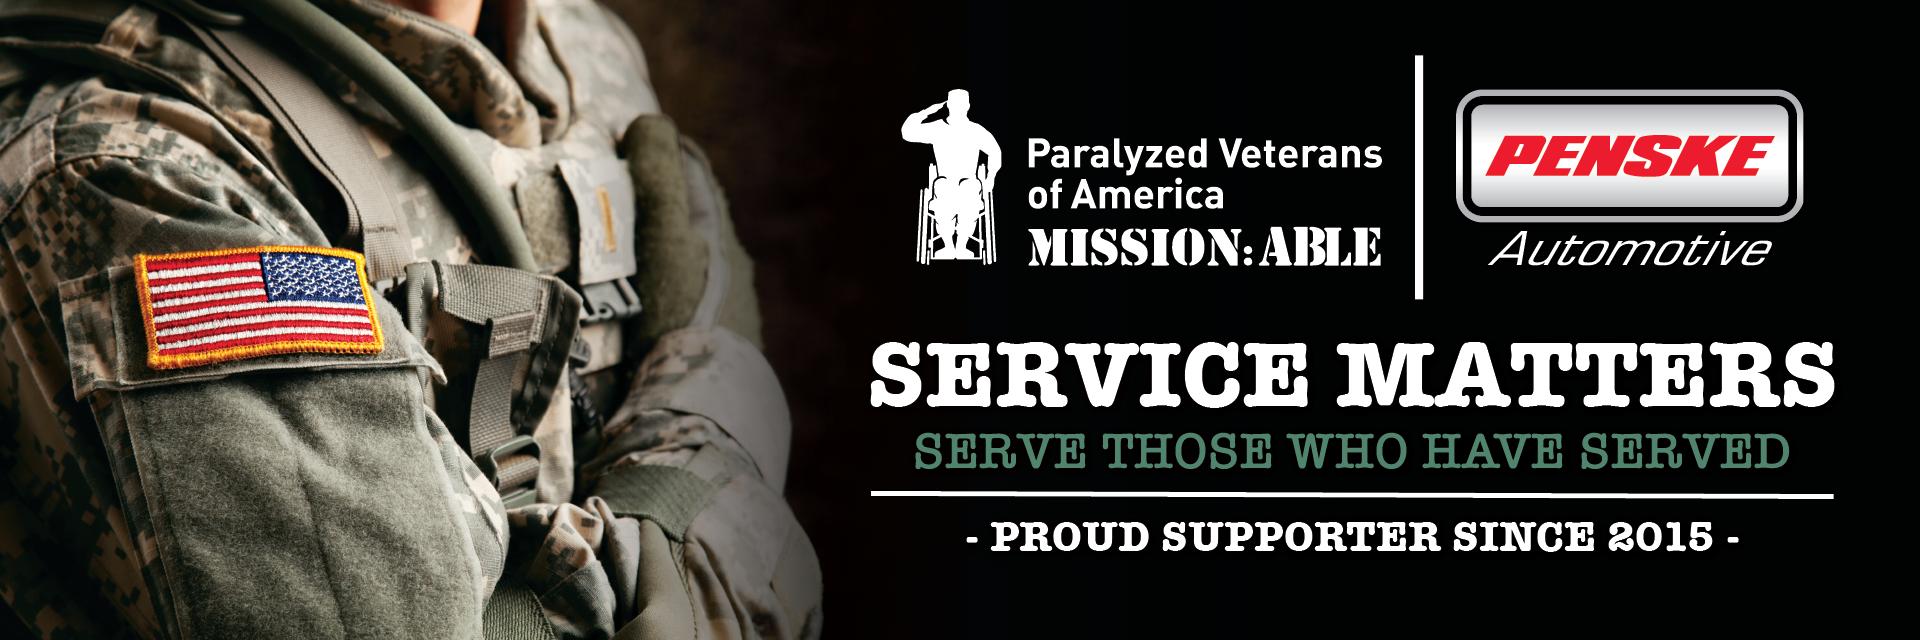 Kearny Mesa Acura PVA Service Matters Banner